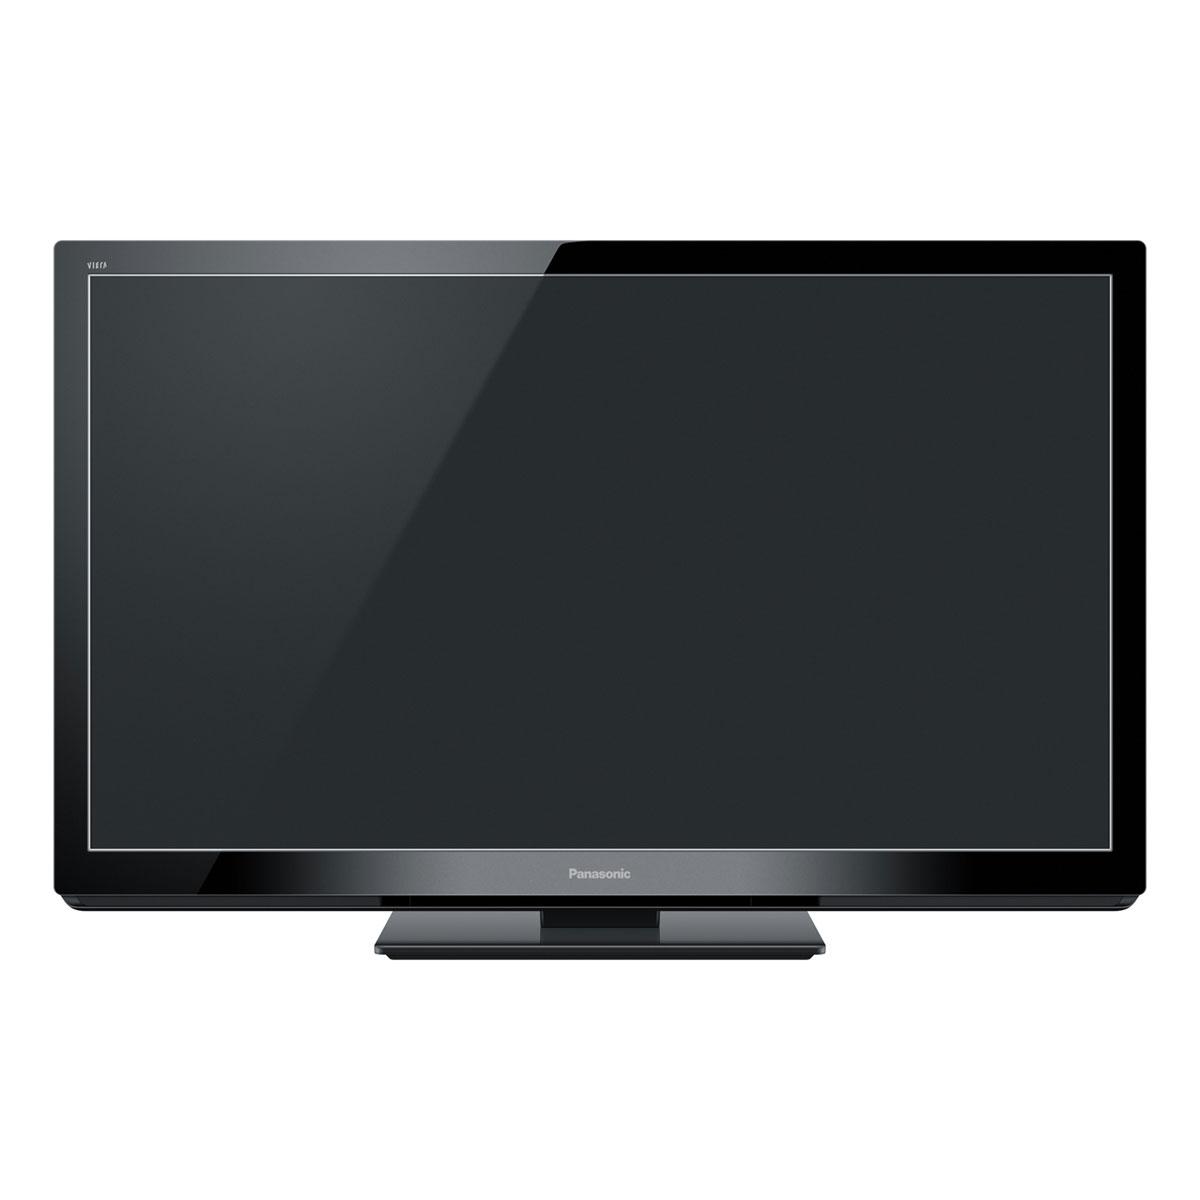 "TV Panasonic TX-P42GT30 Téléviseur Plasma 3D Full HD 42"" (107 cm) 16/9 - 1920 x 1080 pixels - Tuner TNT HD - 600 Hz - HDTV 1080p - DLNA"